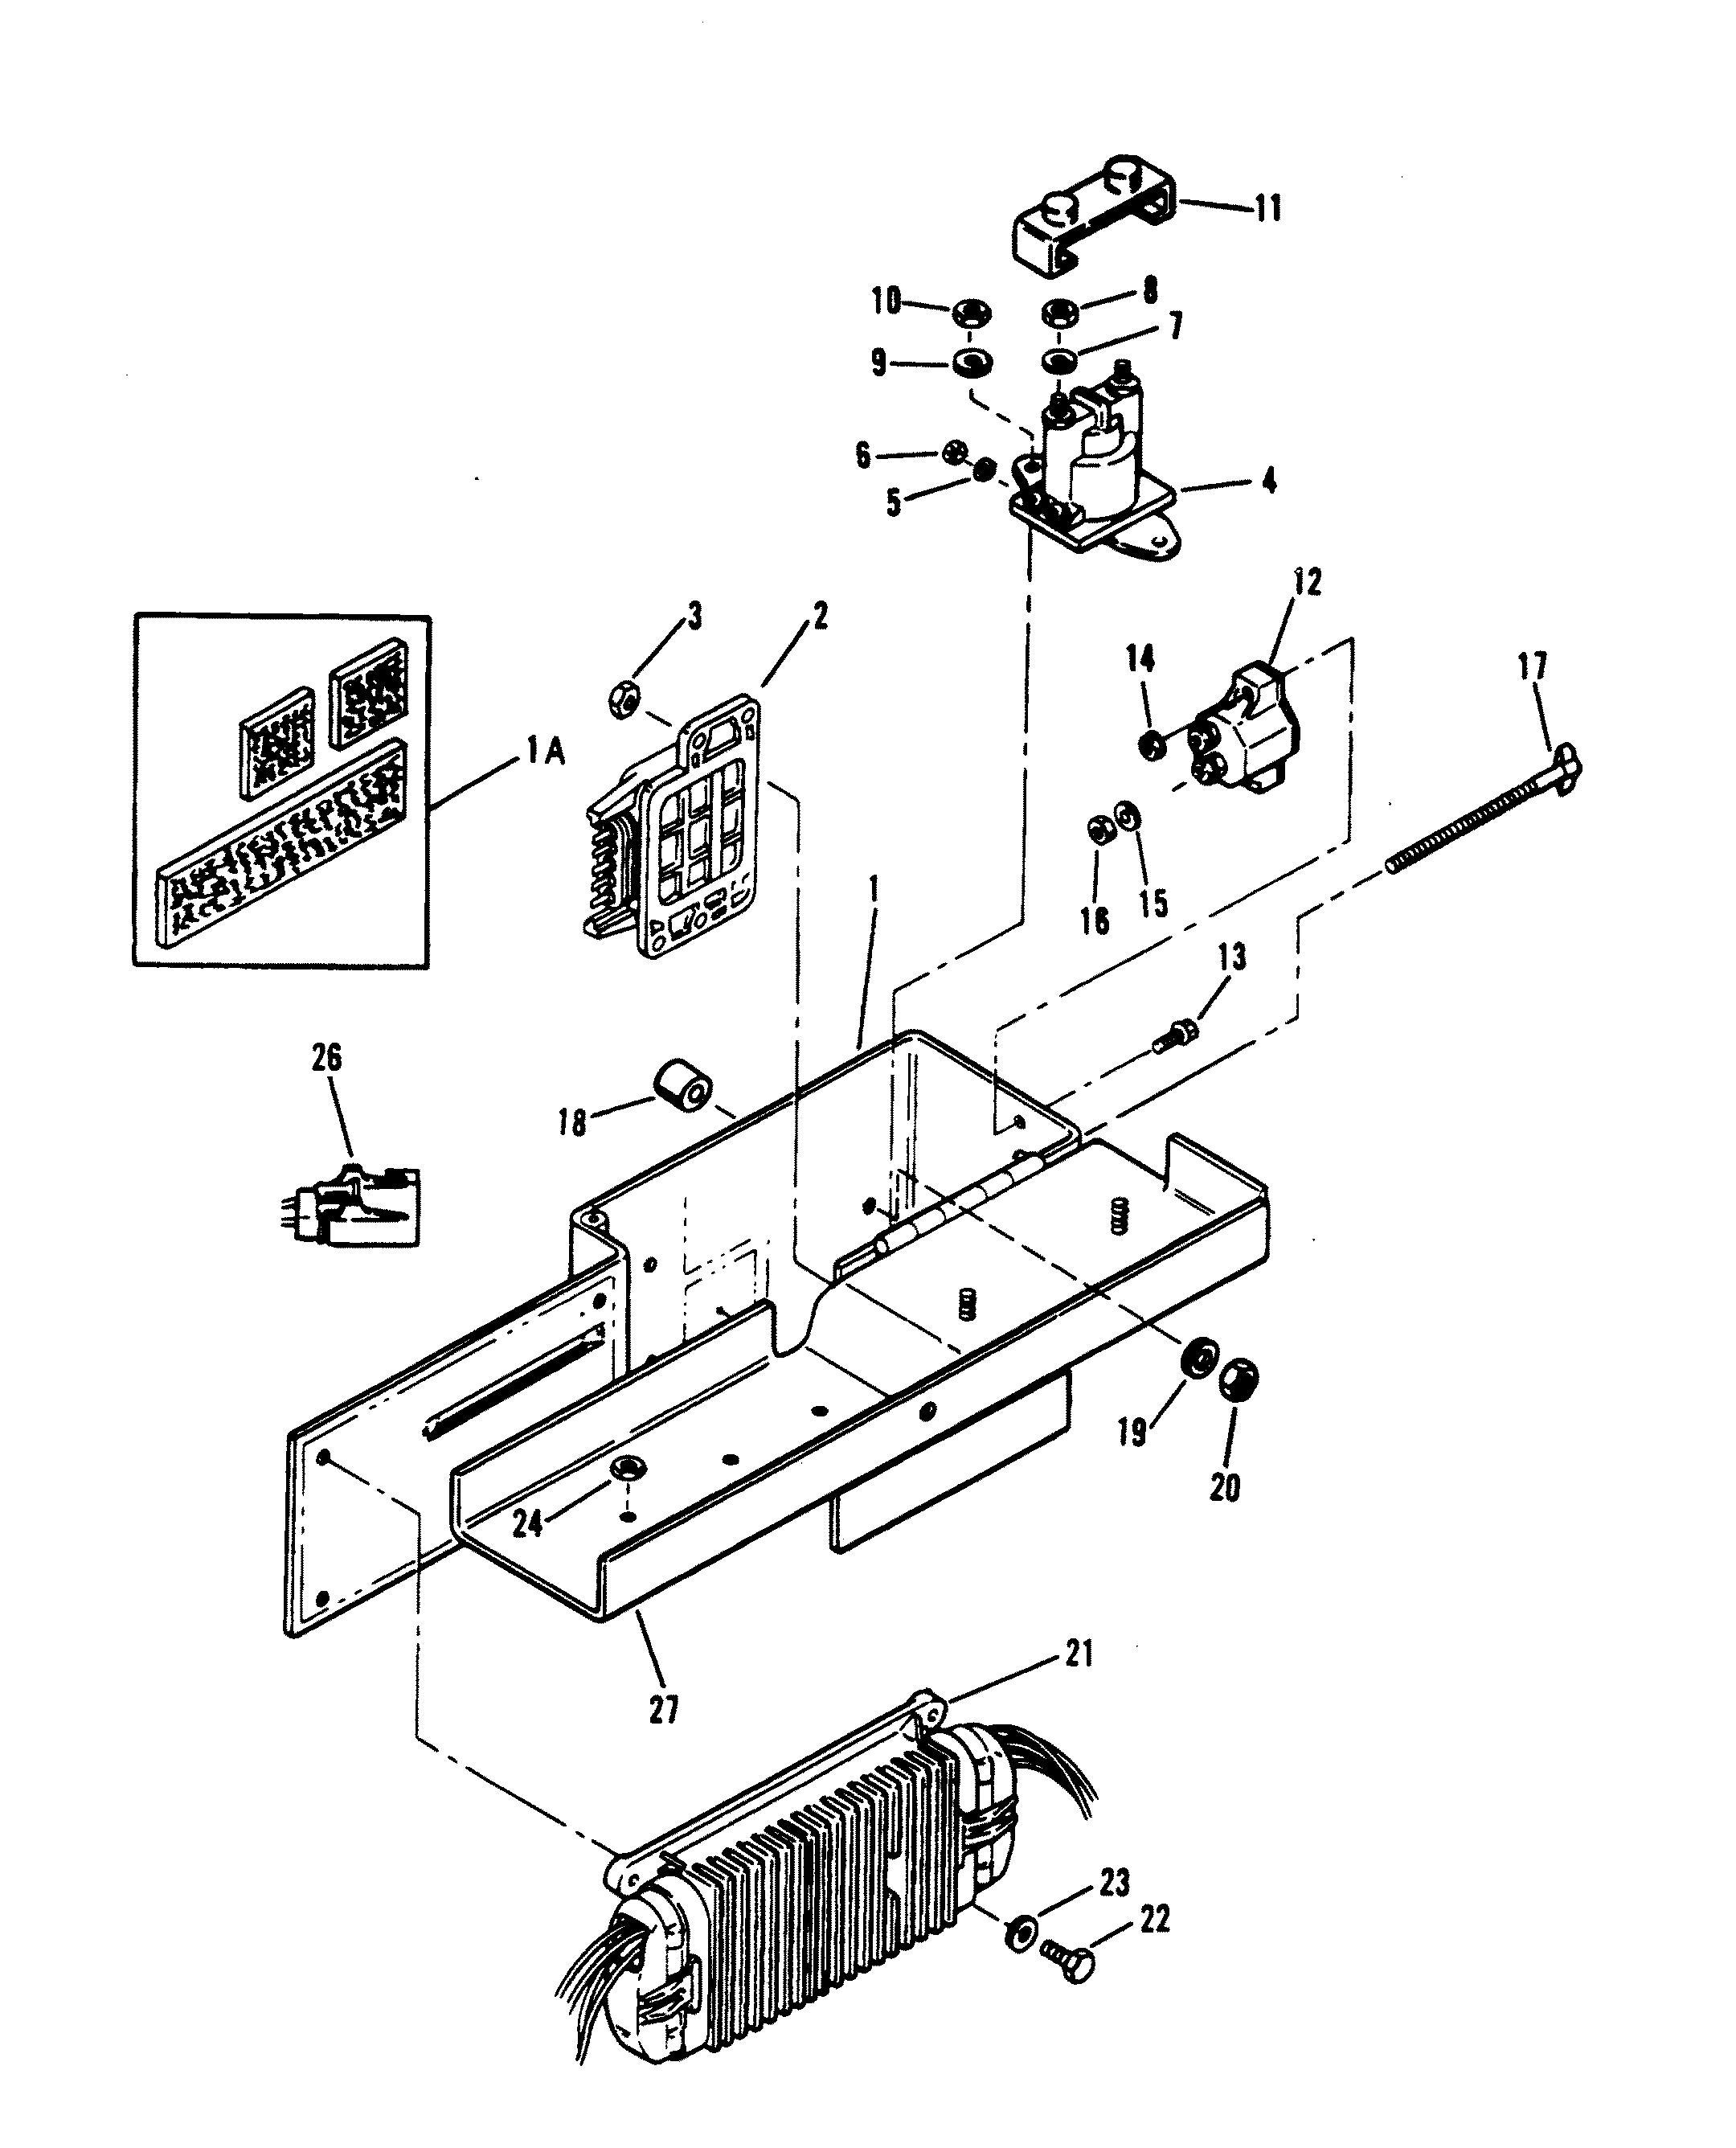 mercruiser 350 mag bravo mpi gm 350 v 8 4.3 Mercruiser Starter Diagram electrical box and ponents